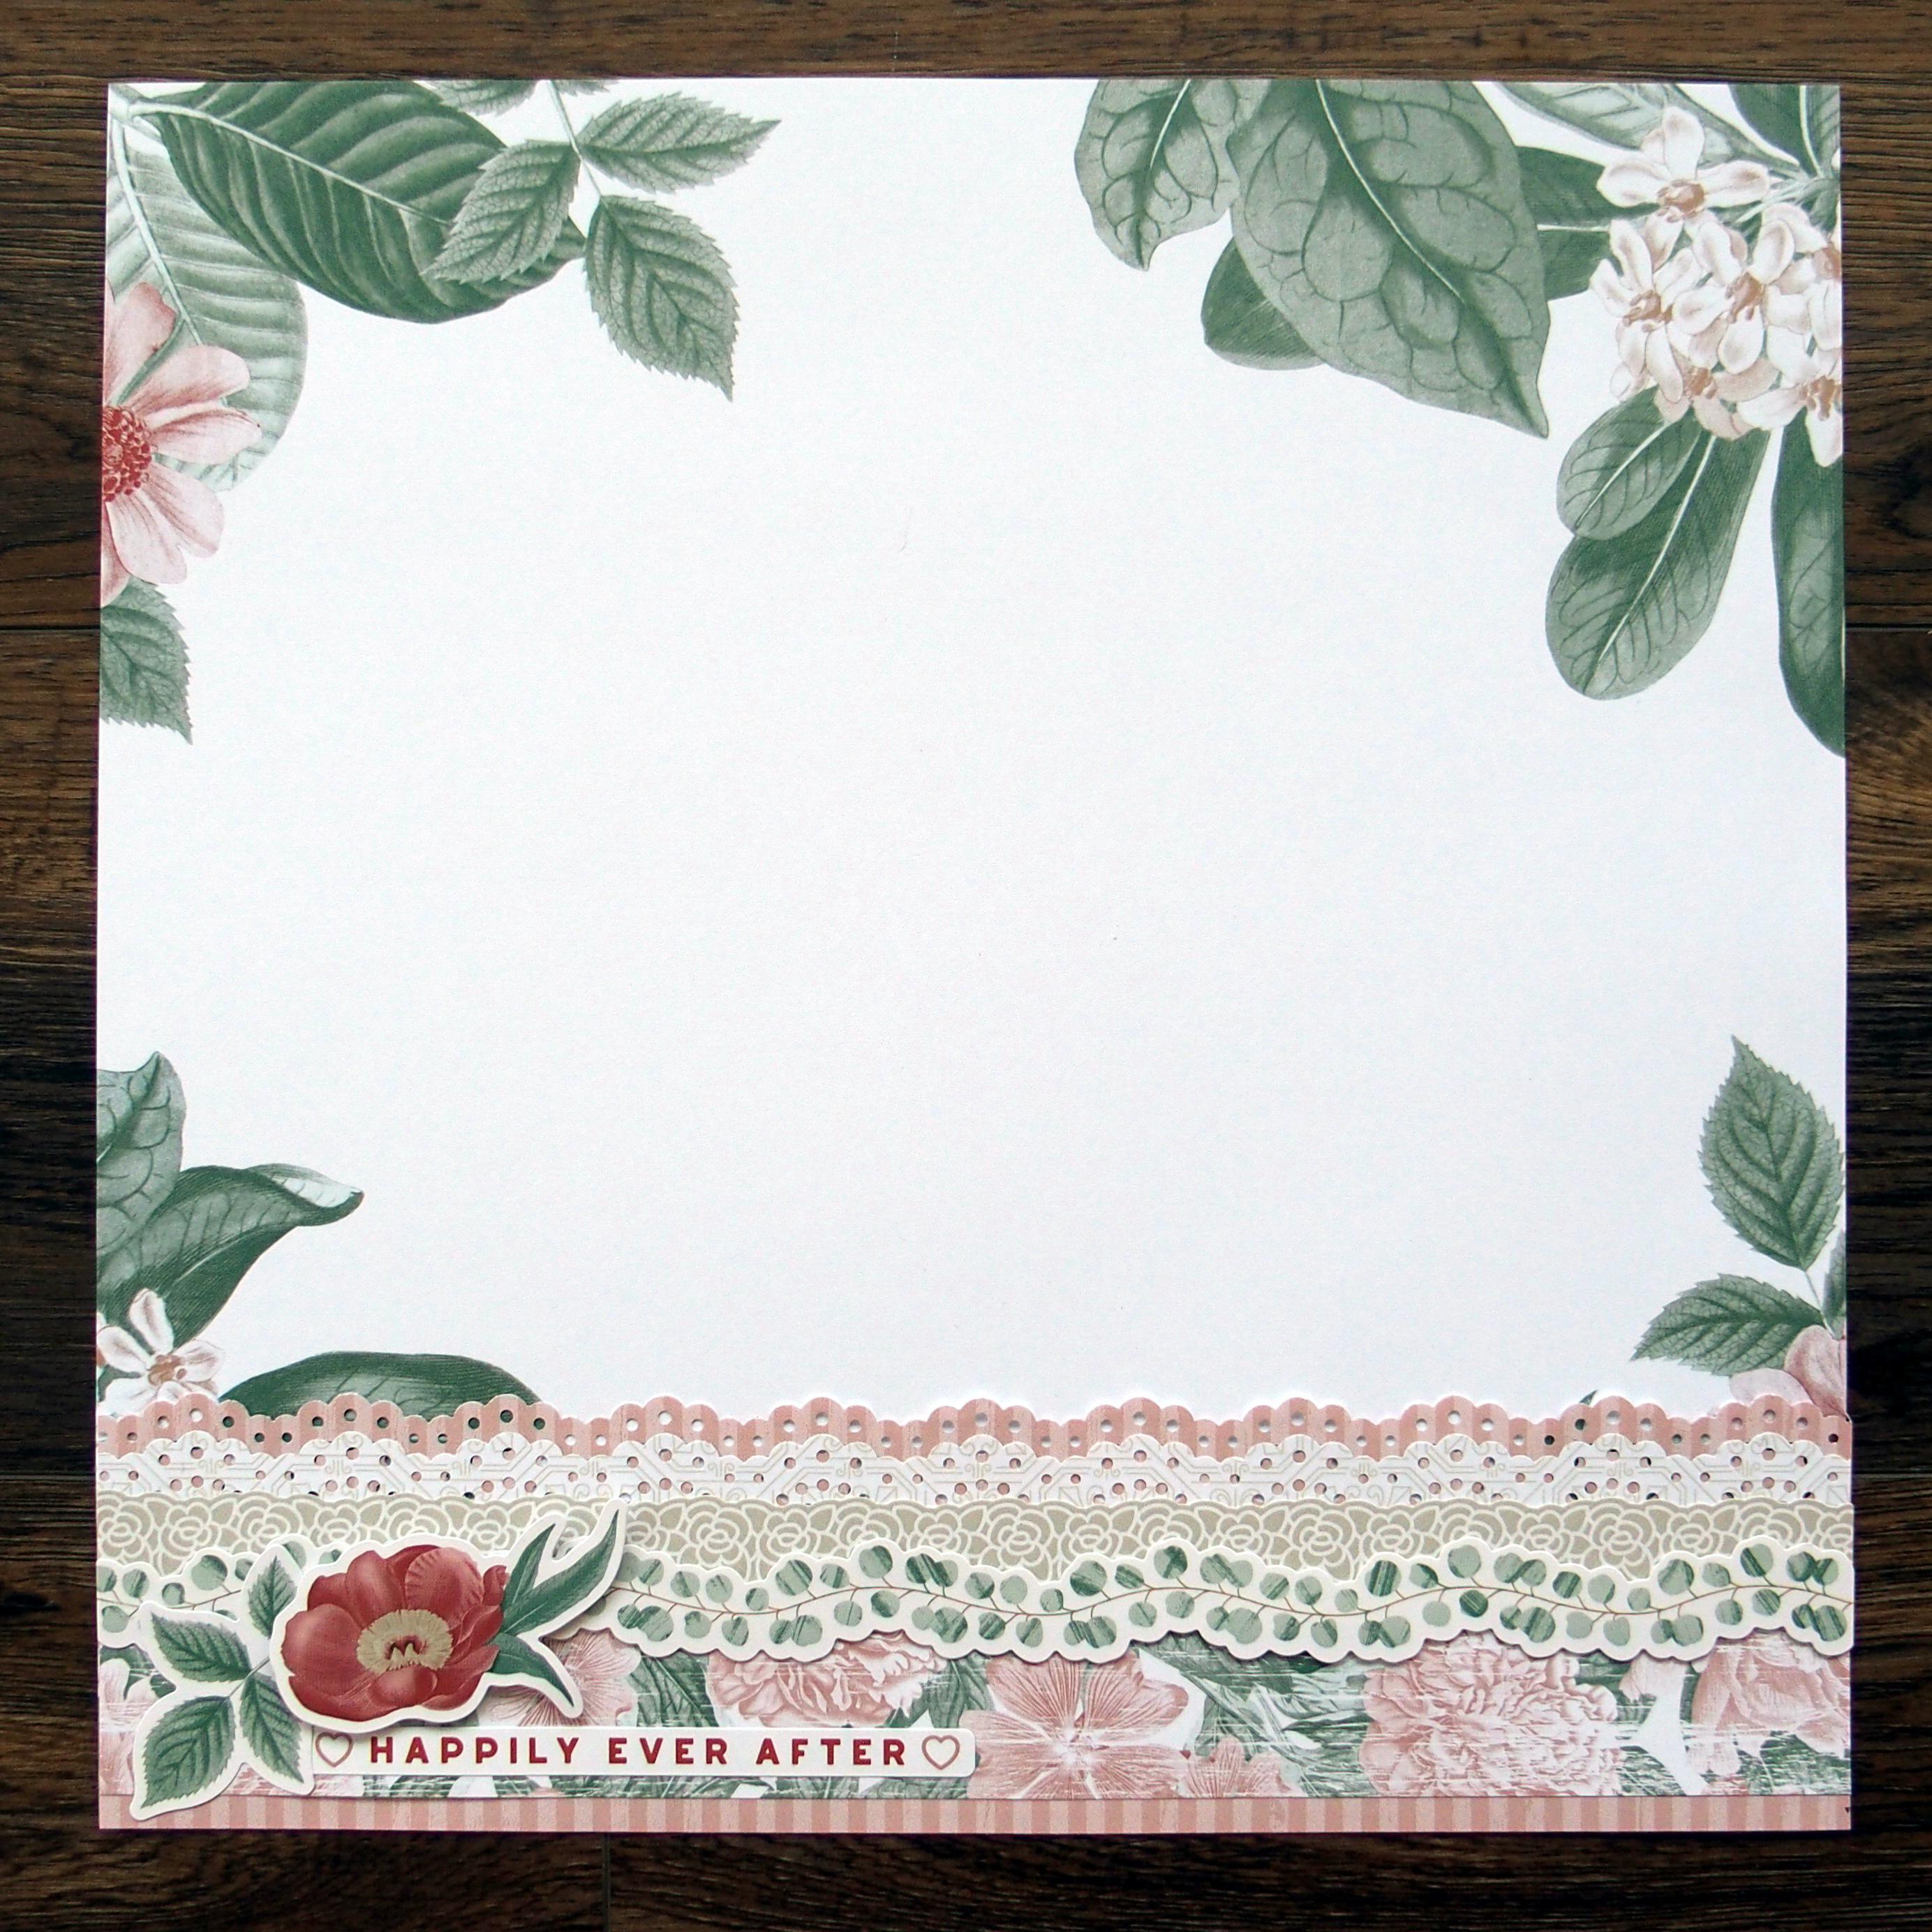 Ever-After-Collection-Wedding-Scrapbooking-Borders-Creative-Memories-3